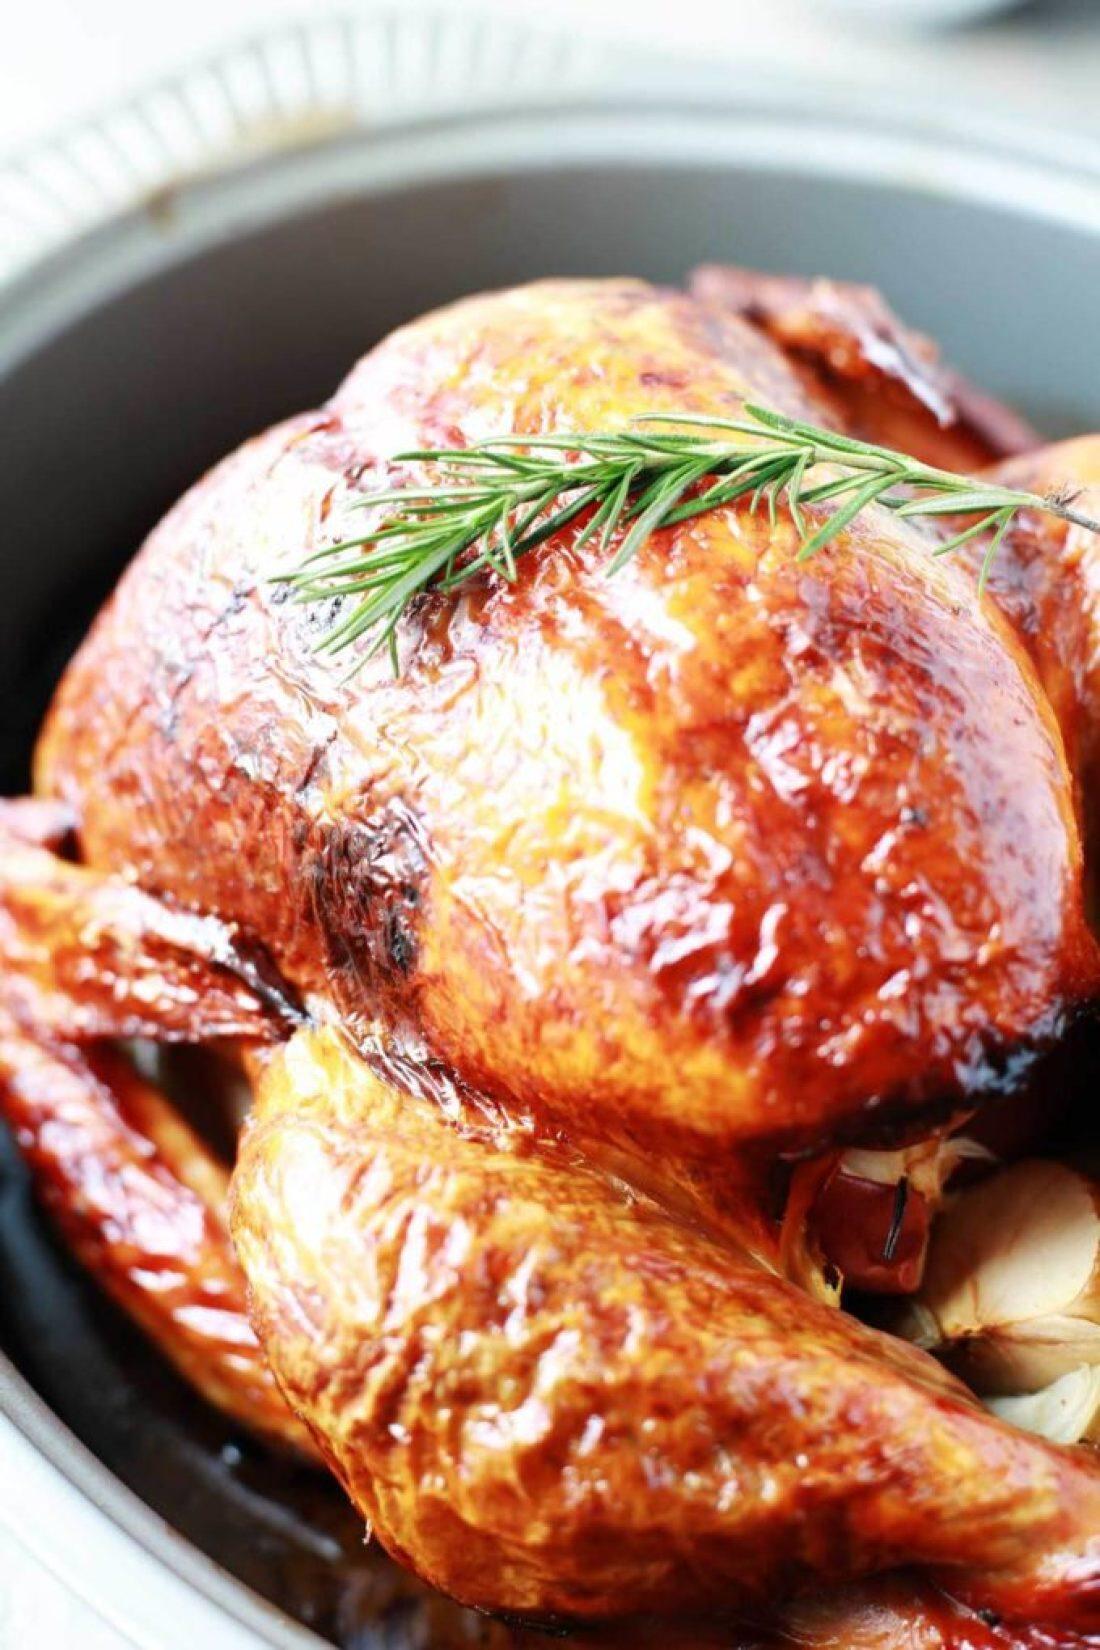 Juicy tender roasted turkey in roasting pan with rosemary for garnish